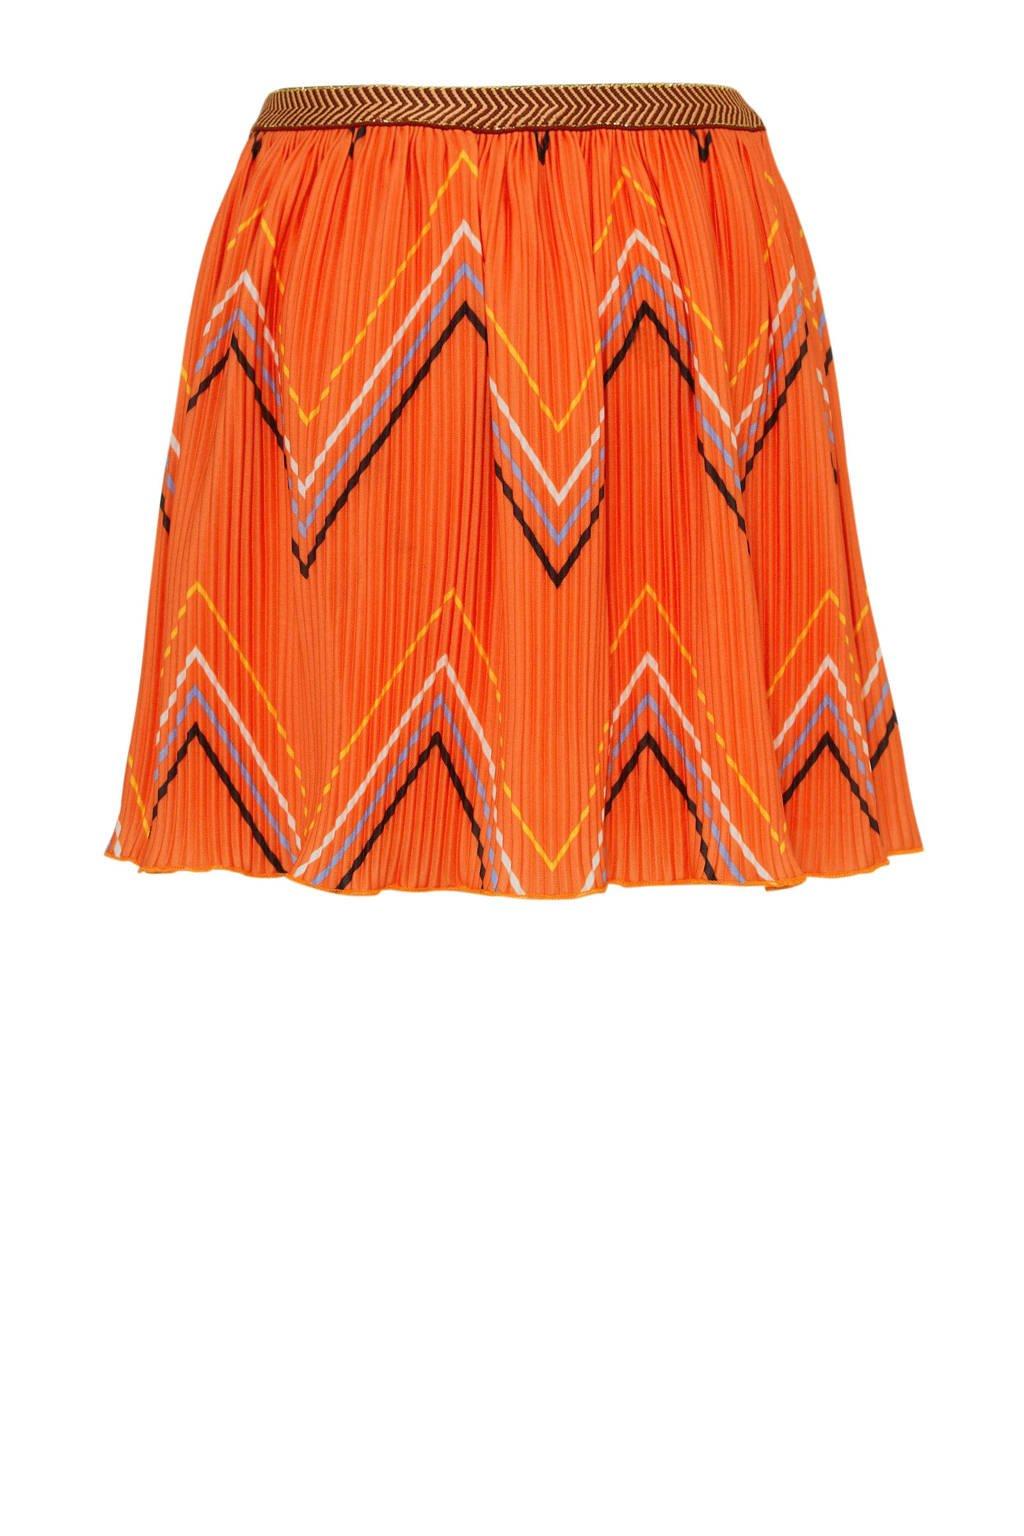 Tumble 'n Dry Mid rok Lolita met all over print oranje, Oranje